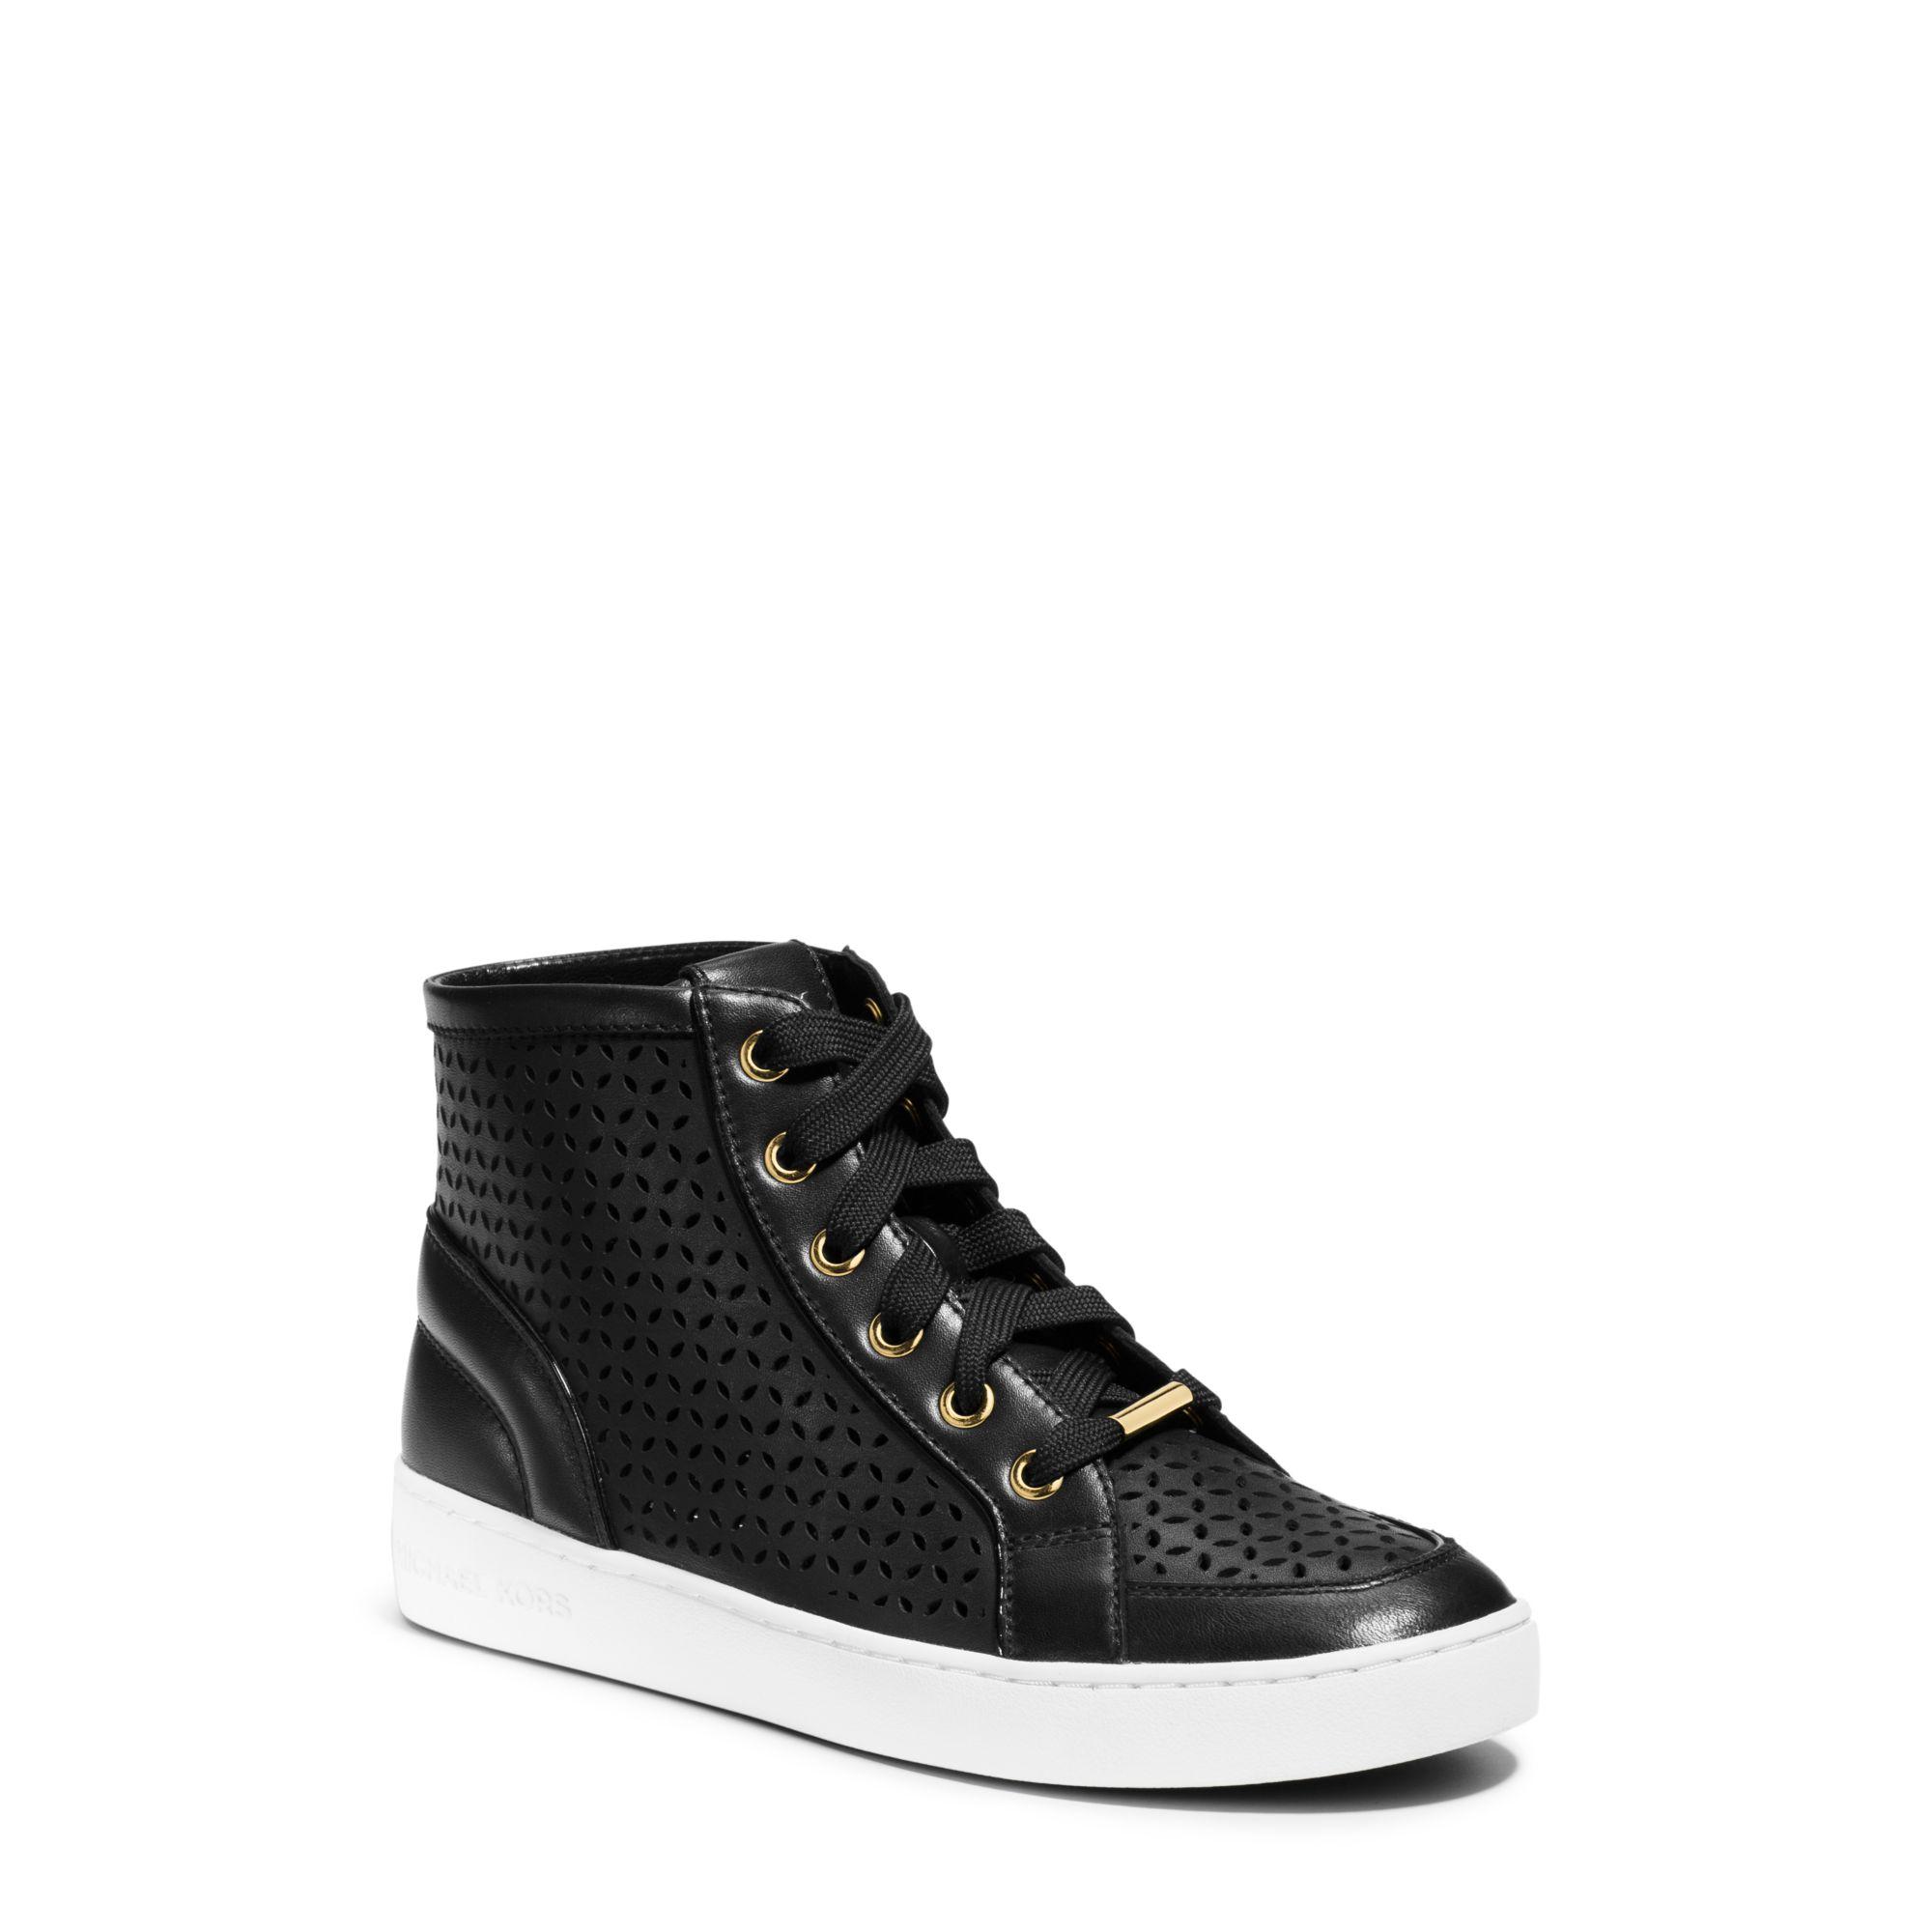 michael kors olivia high top leather sneaker in black lyst. Black Bedroom Furniture Sets. Home Design Ideas